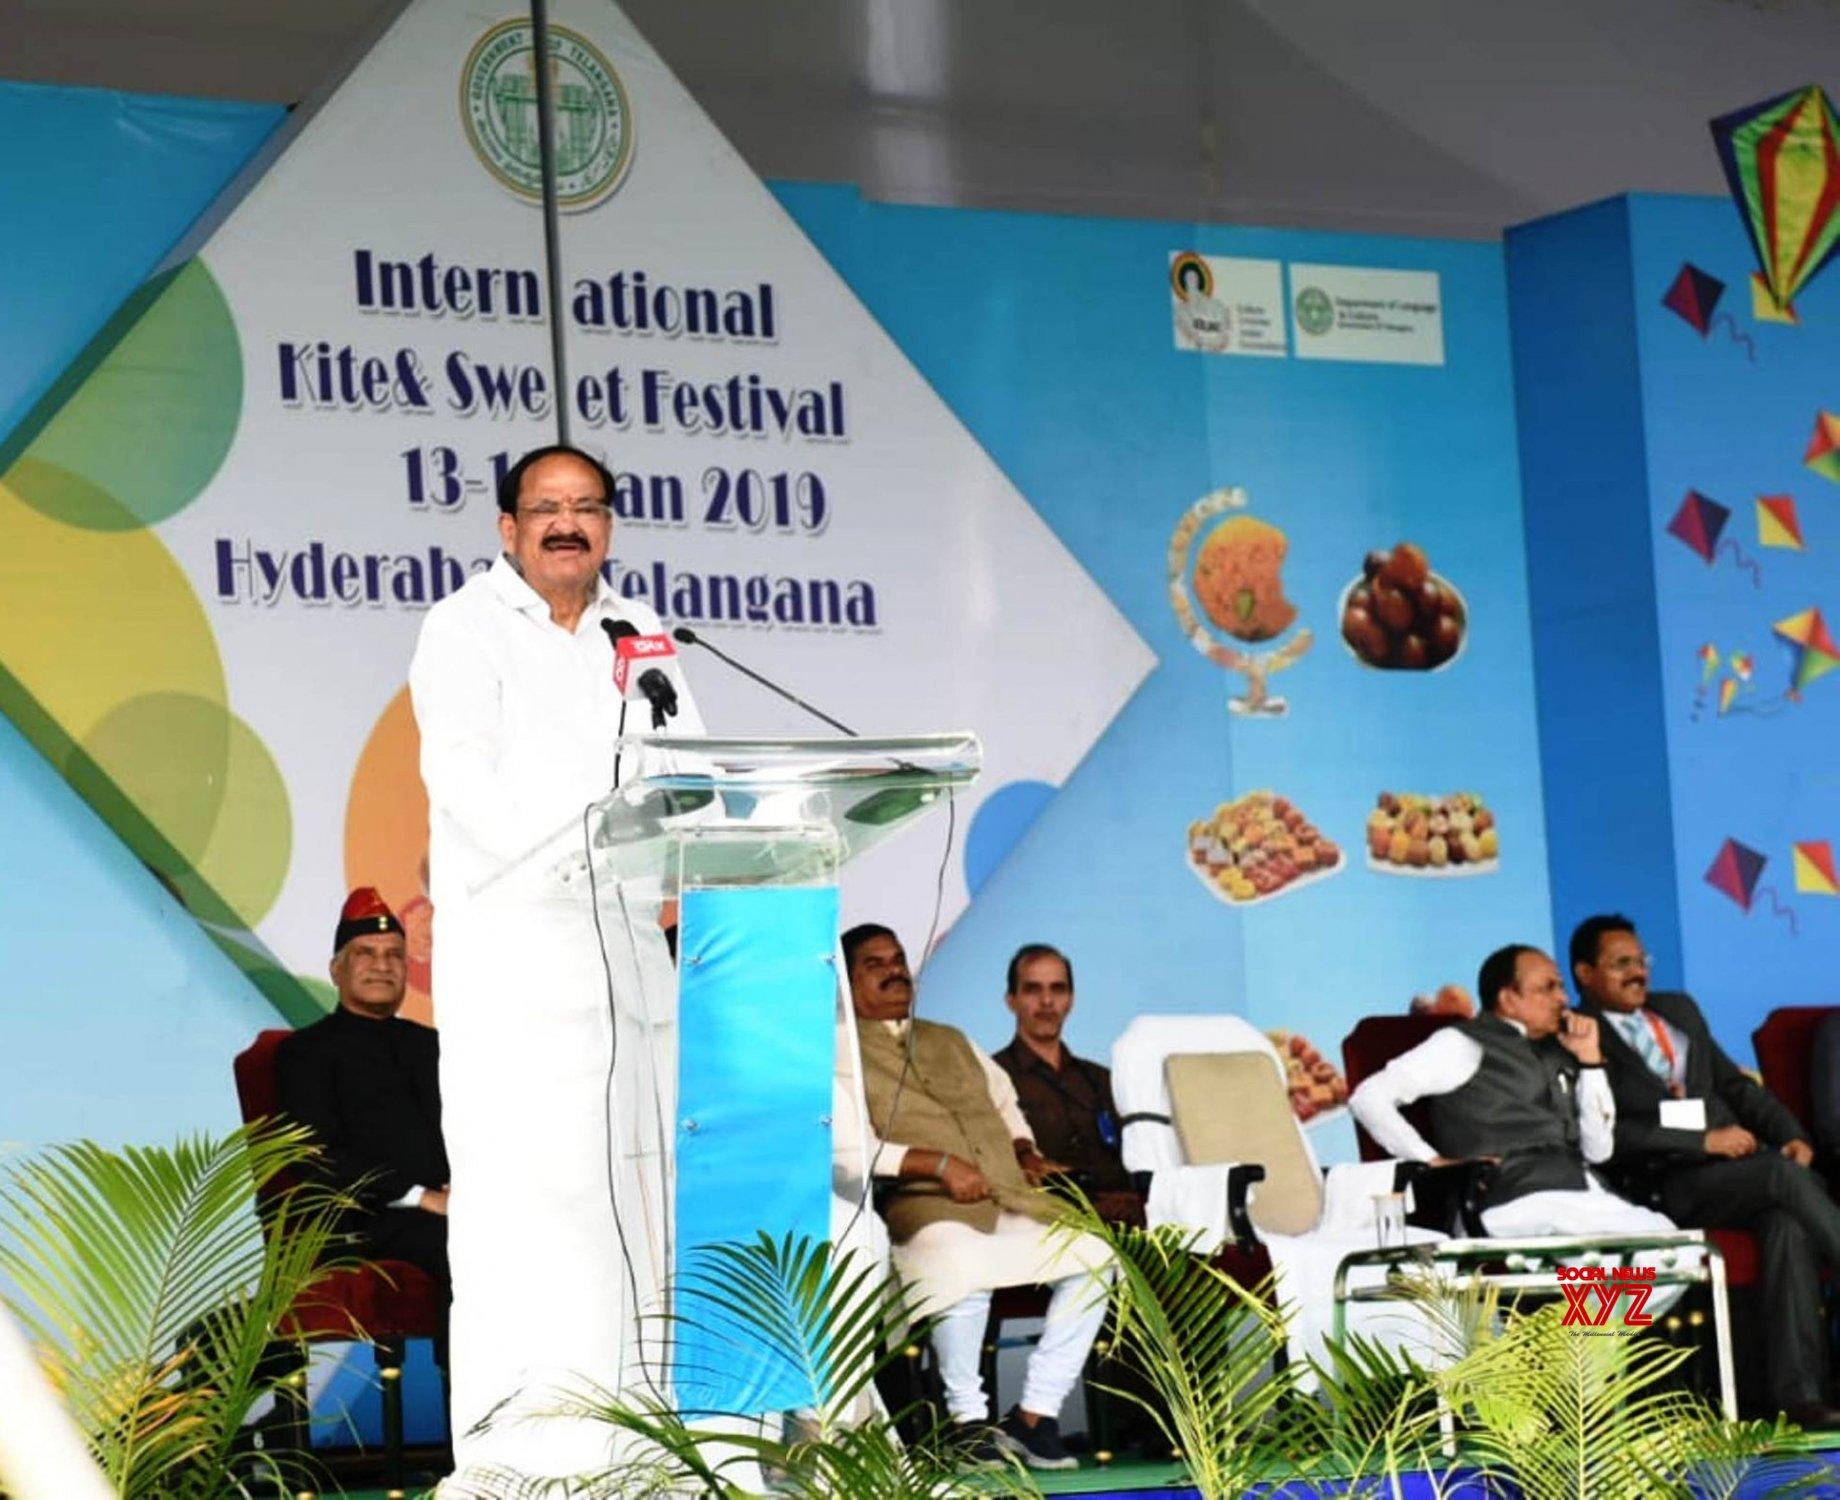 Hyderabad: Venkaiah Naidu at 4th Telangana International Kite Festival #Gallery